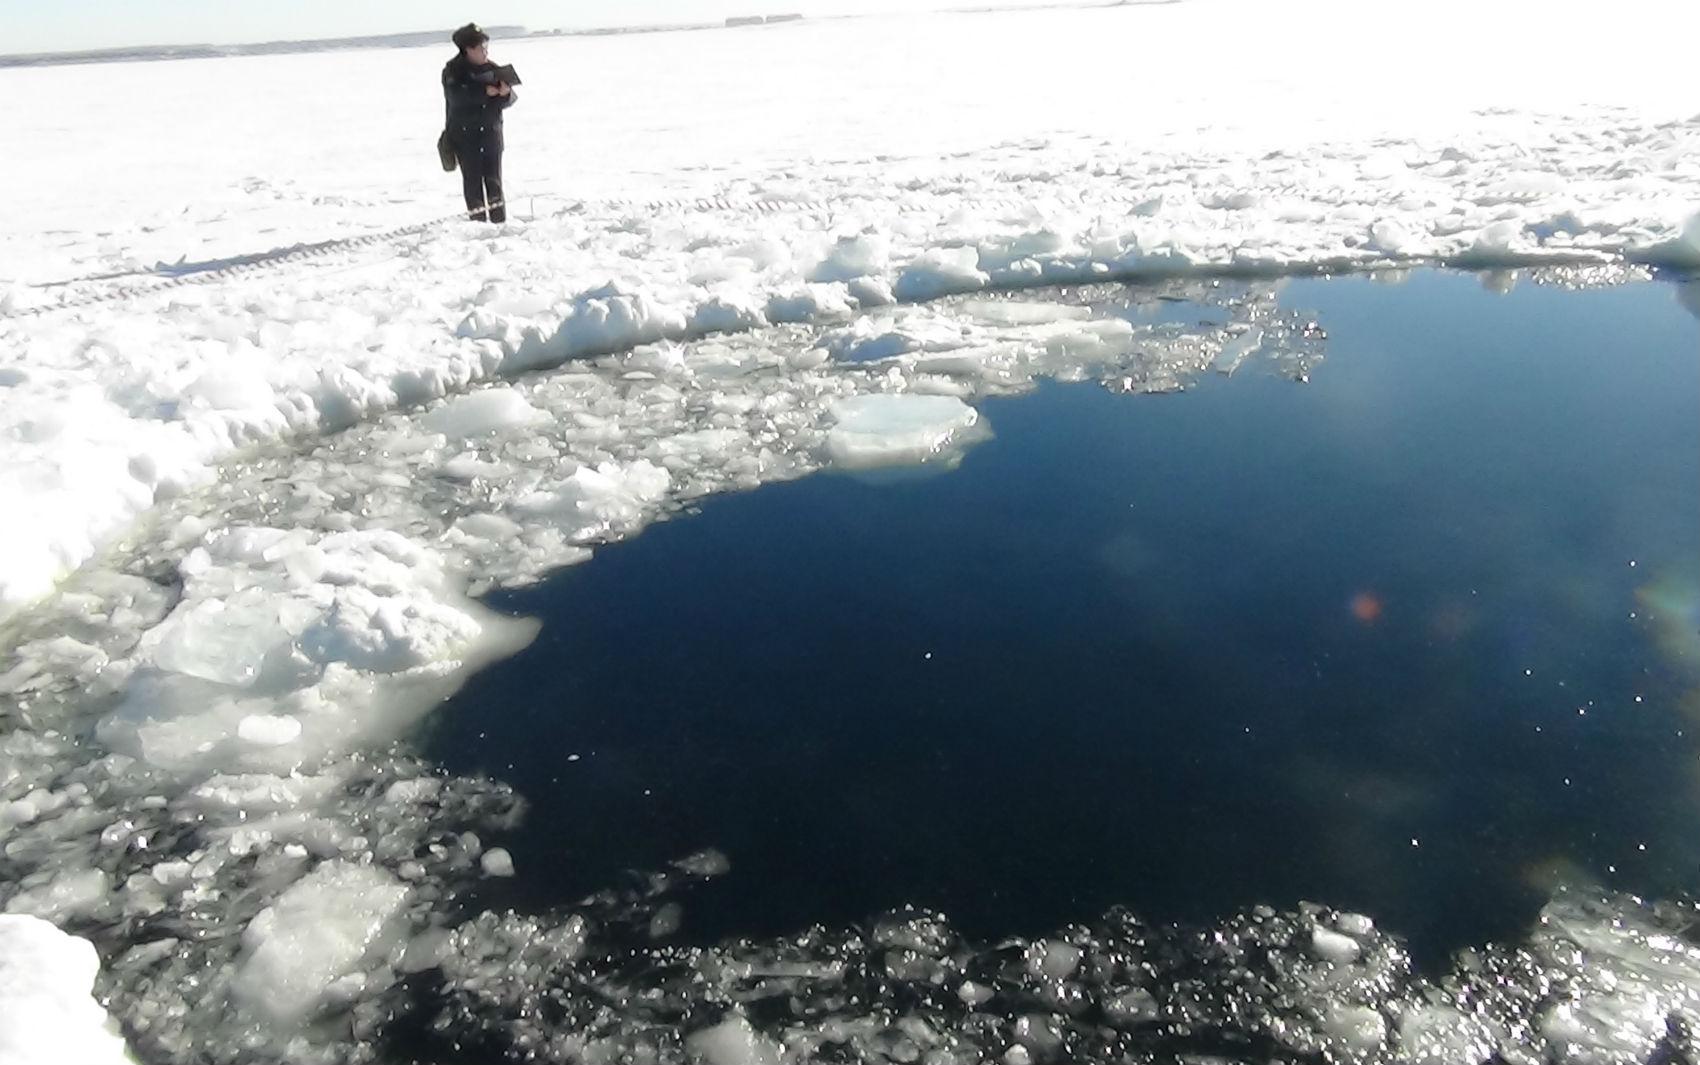 Pessoa observa buraco provocado por suposto meteorito em lago congelado Chebarkul na Rússia.